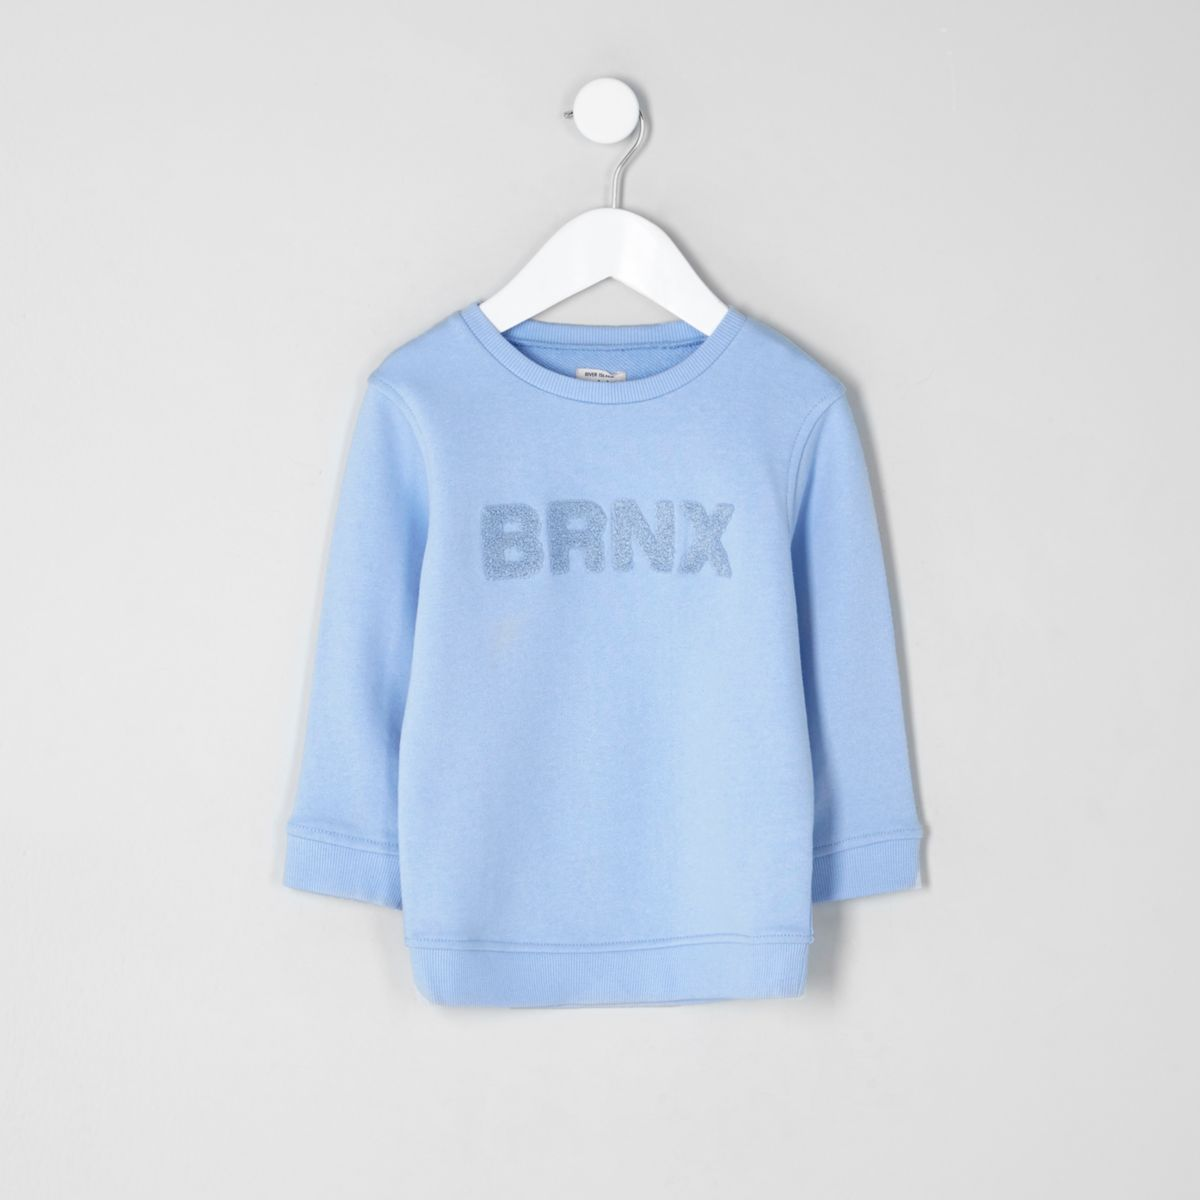 Mini boys blue 'brnx' sweatshirt